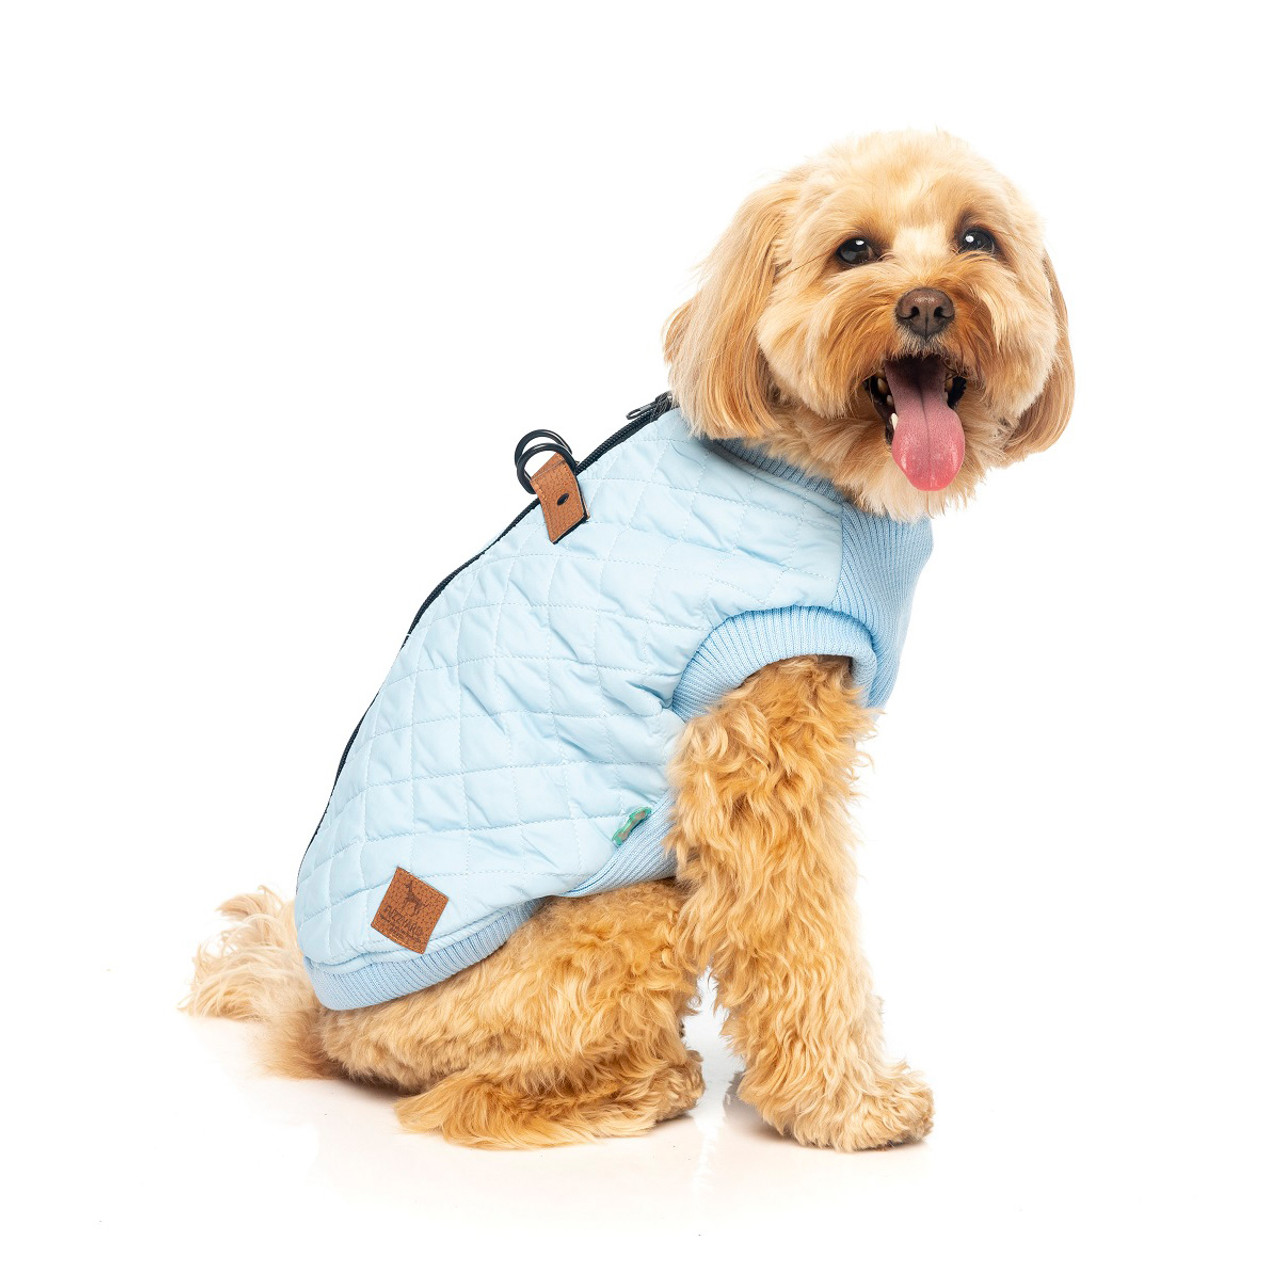 FuzzYard MacGyver Harness Jacket Blue Zip up warm winter dog puppy jacket coat apparel